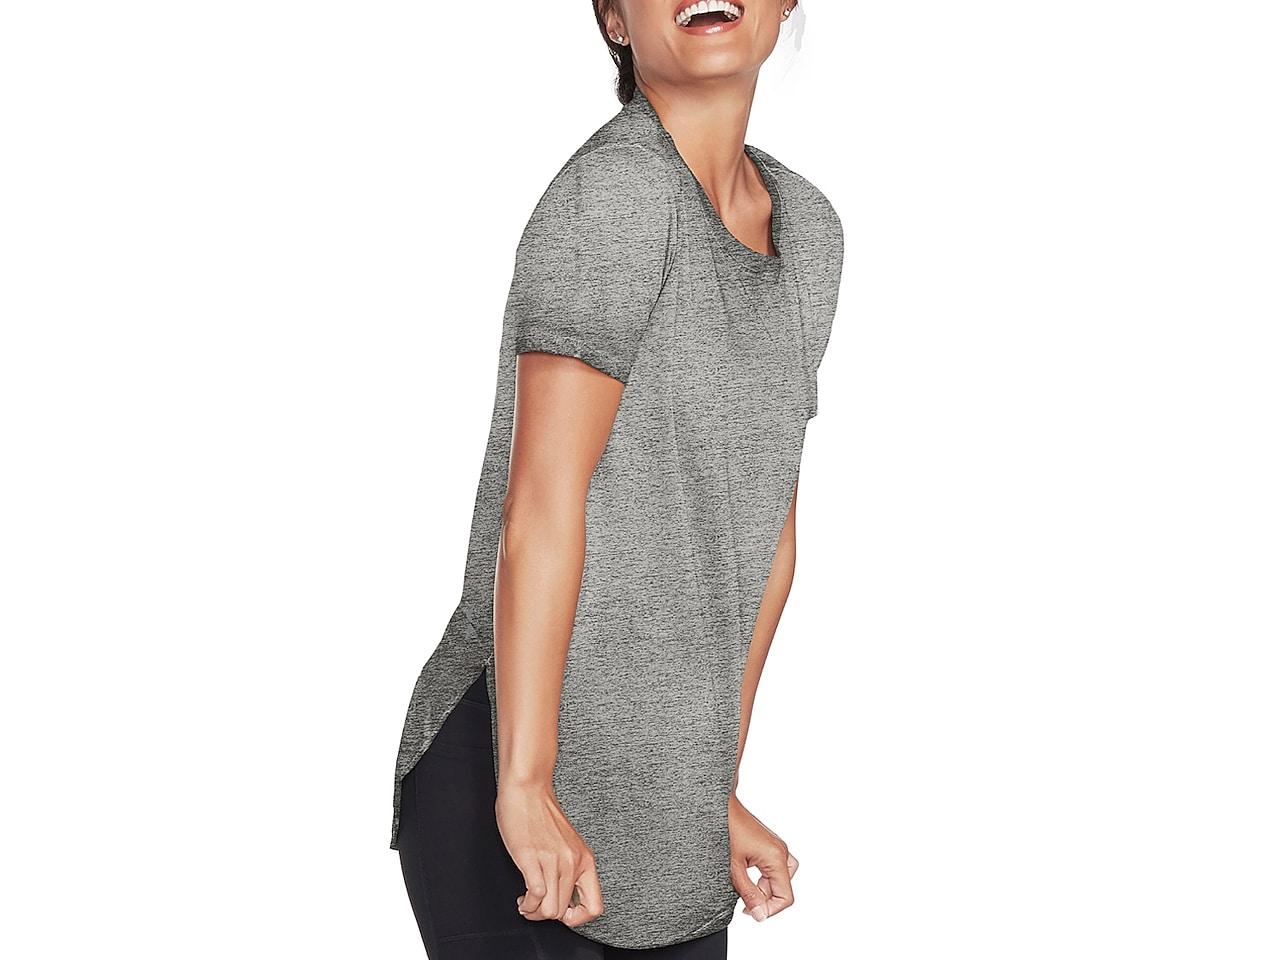 Skechers Godri Essential Women's Short-Sleeve Tunic